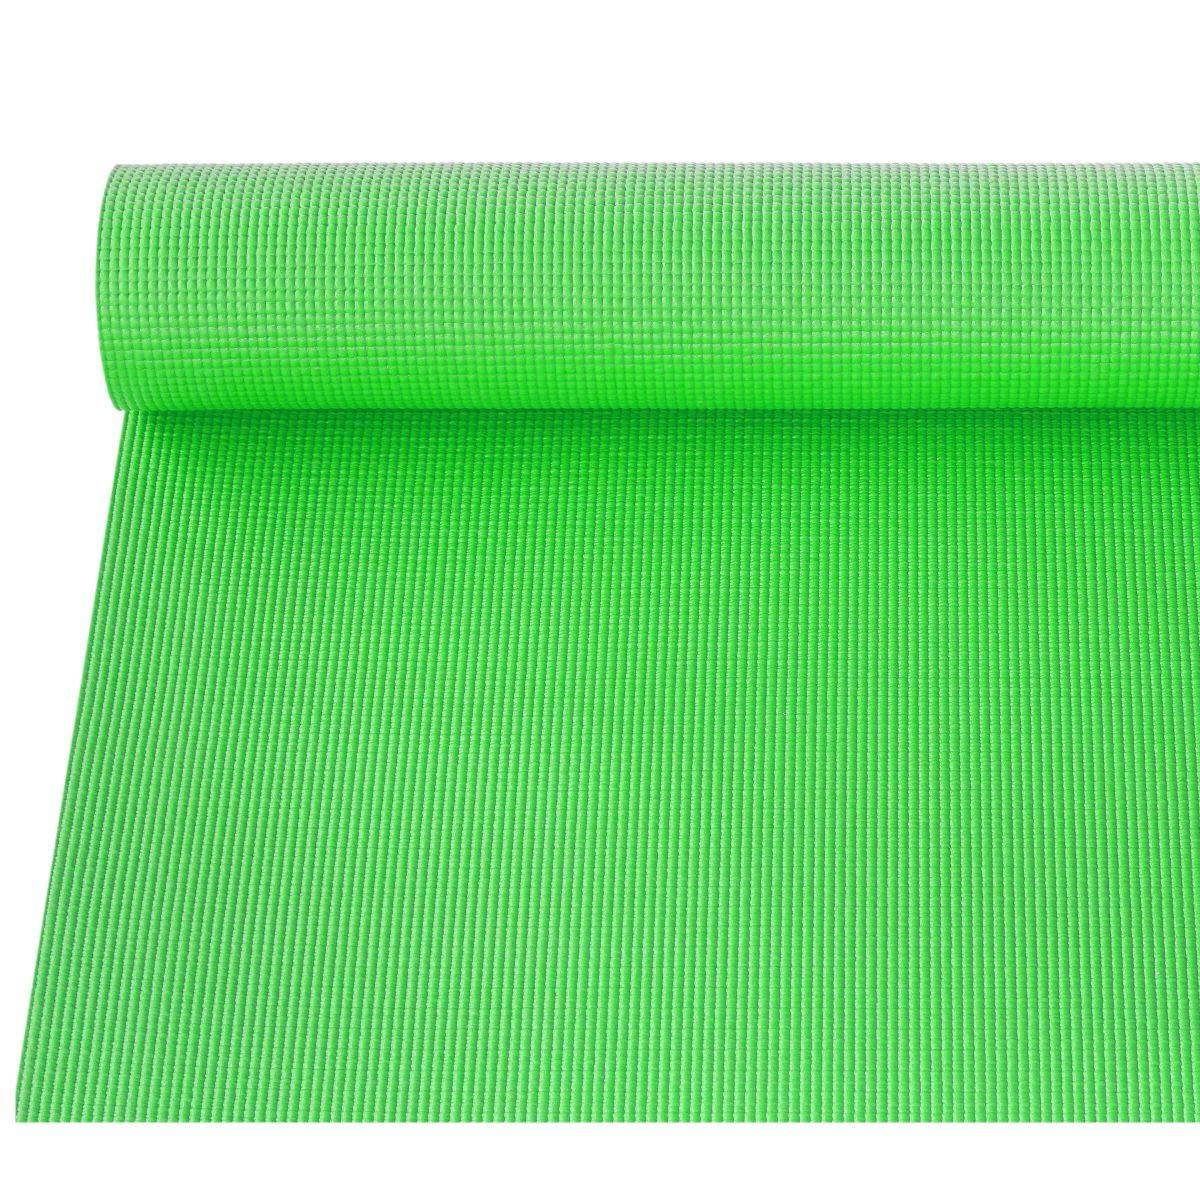 KSAR Sports Large Green Yoga Mat & FREE Carry Bag - 173cm x 61cm - 6mm PVC Foam - YOGA/PILATES/HOME